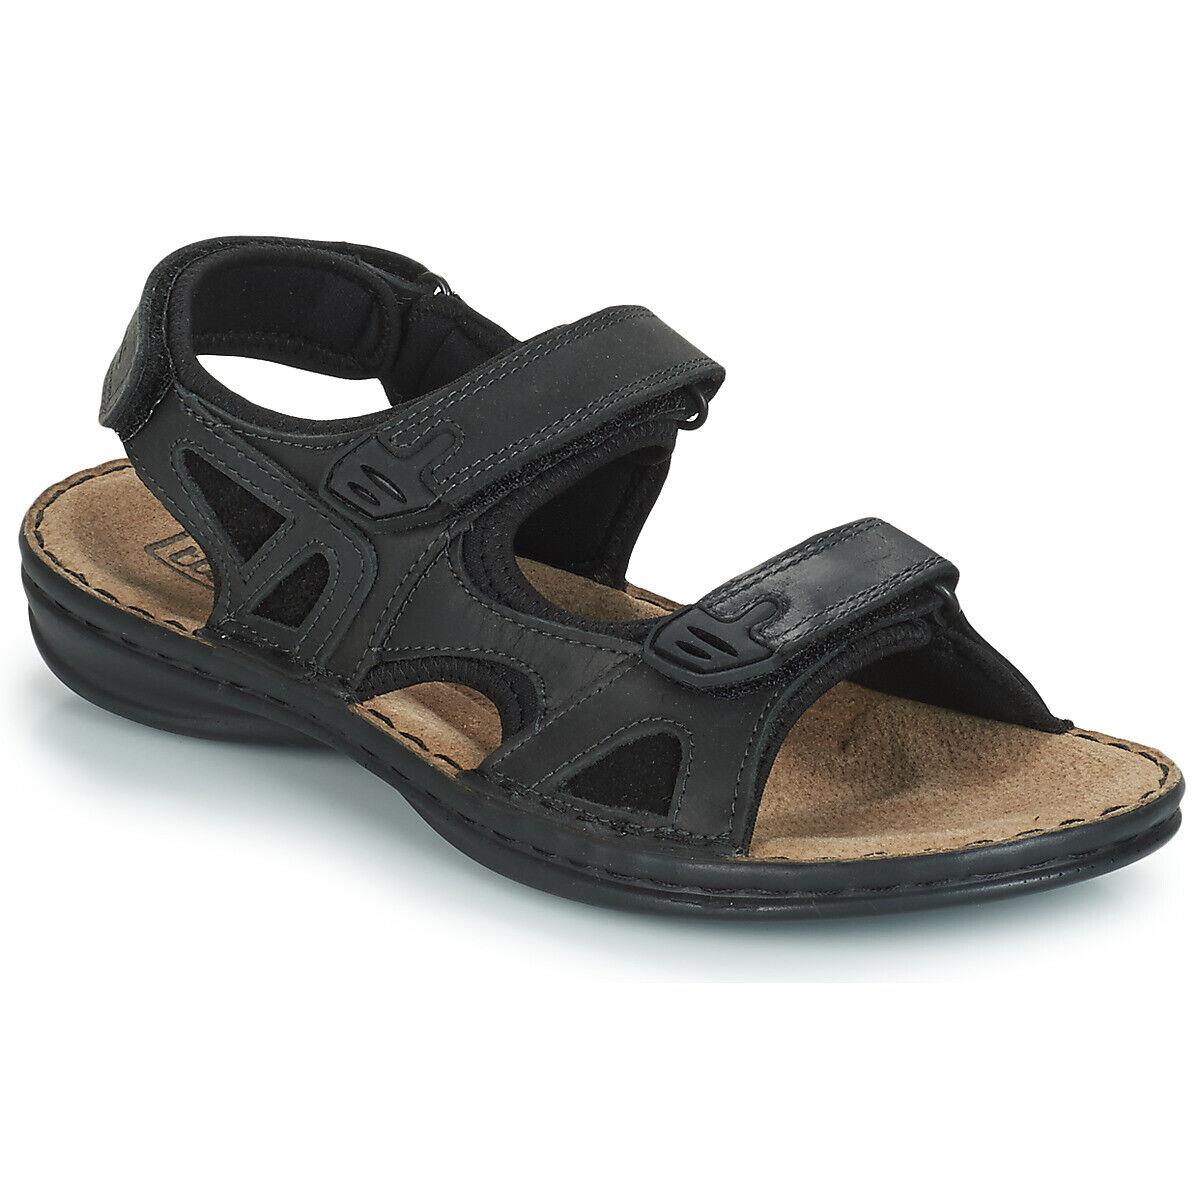 Tbs berric black leather sandal, man.